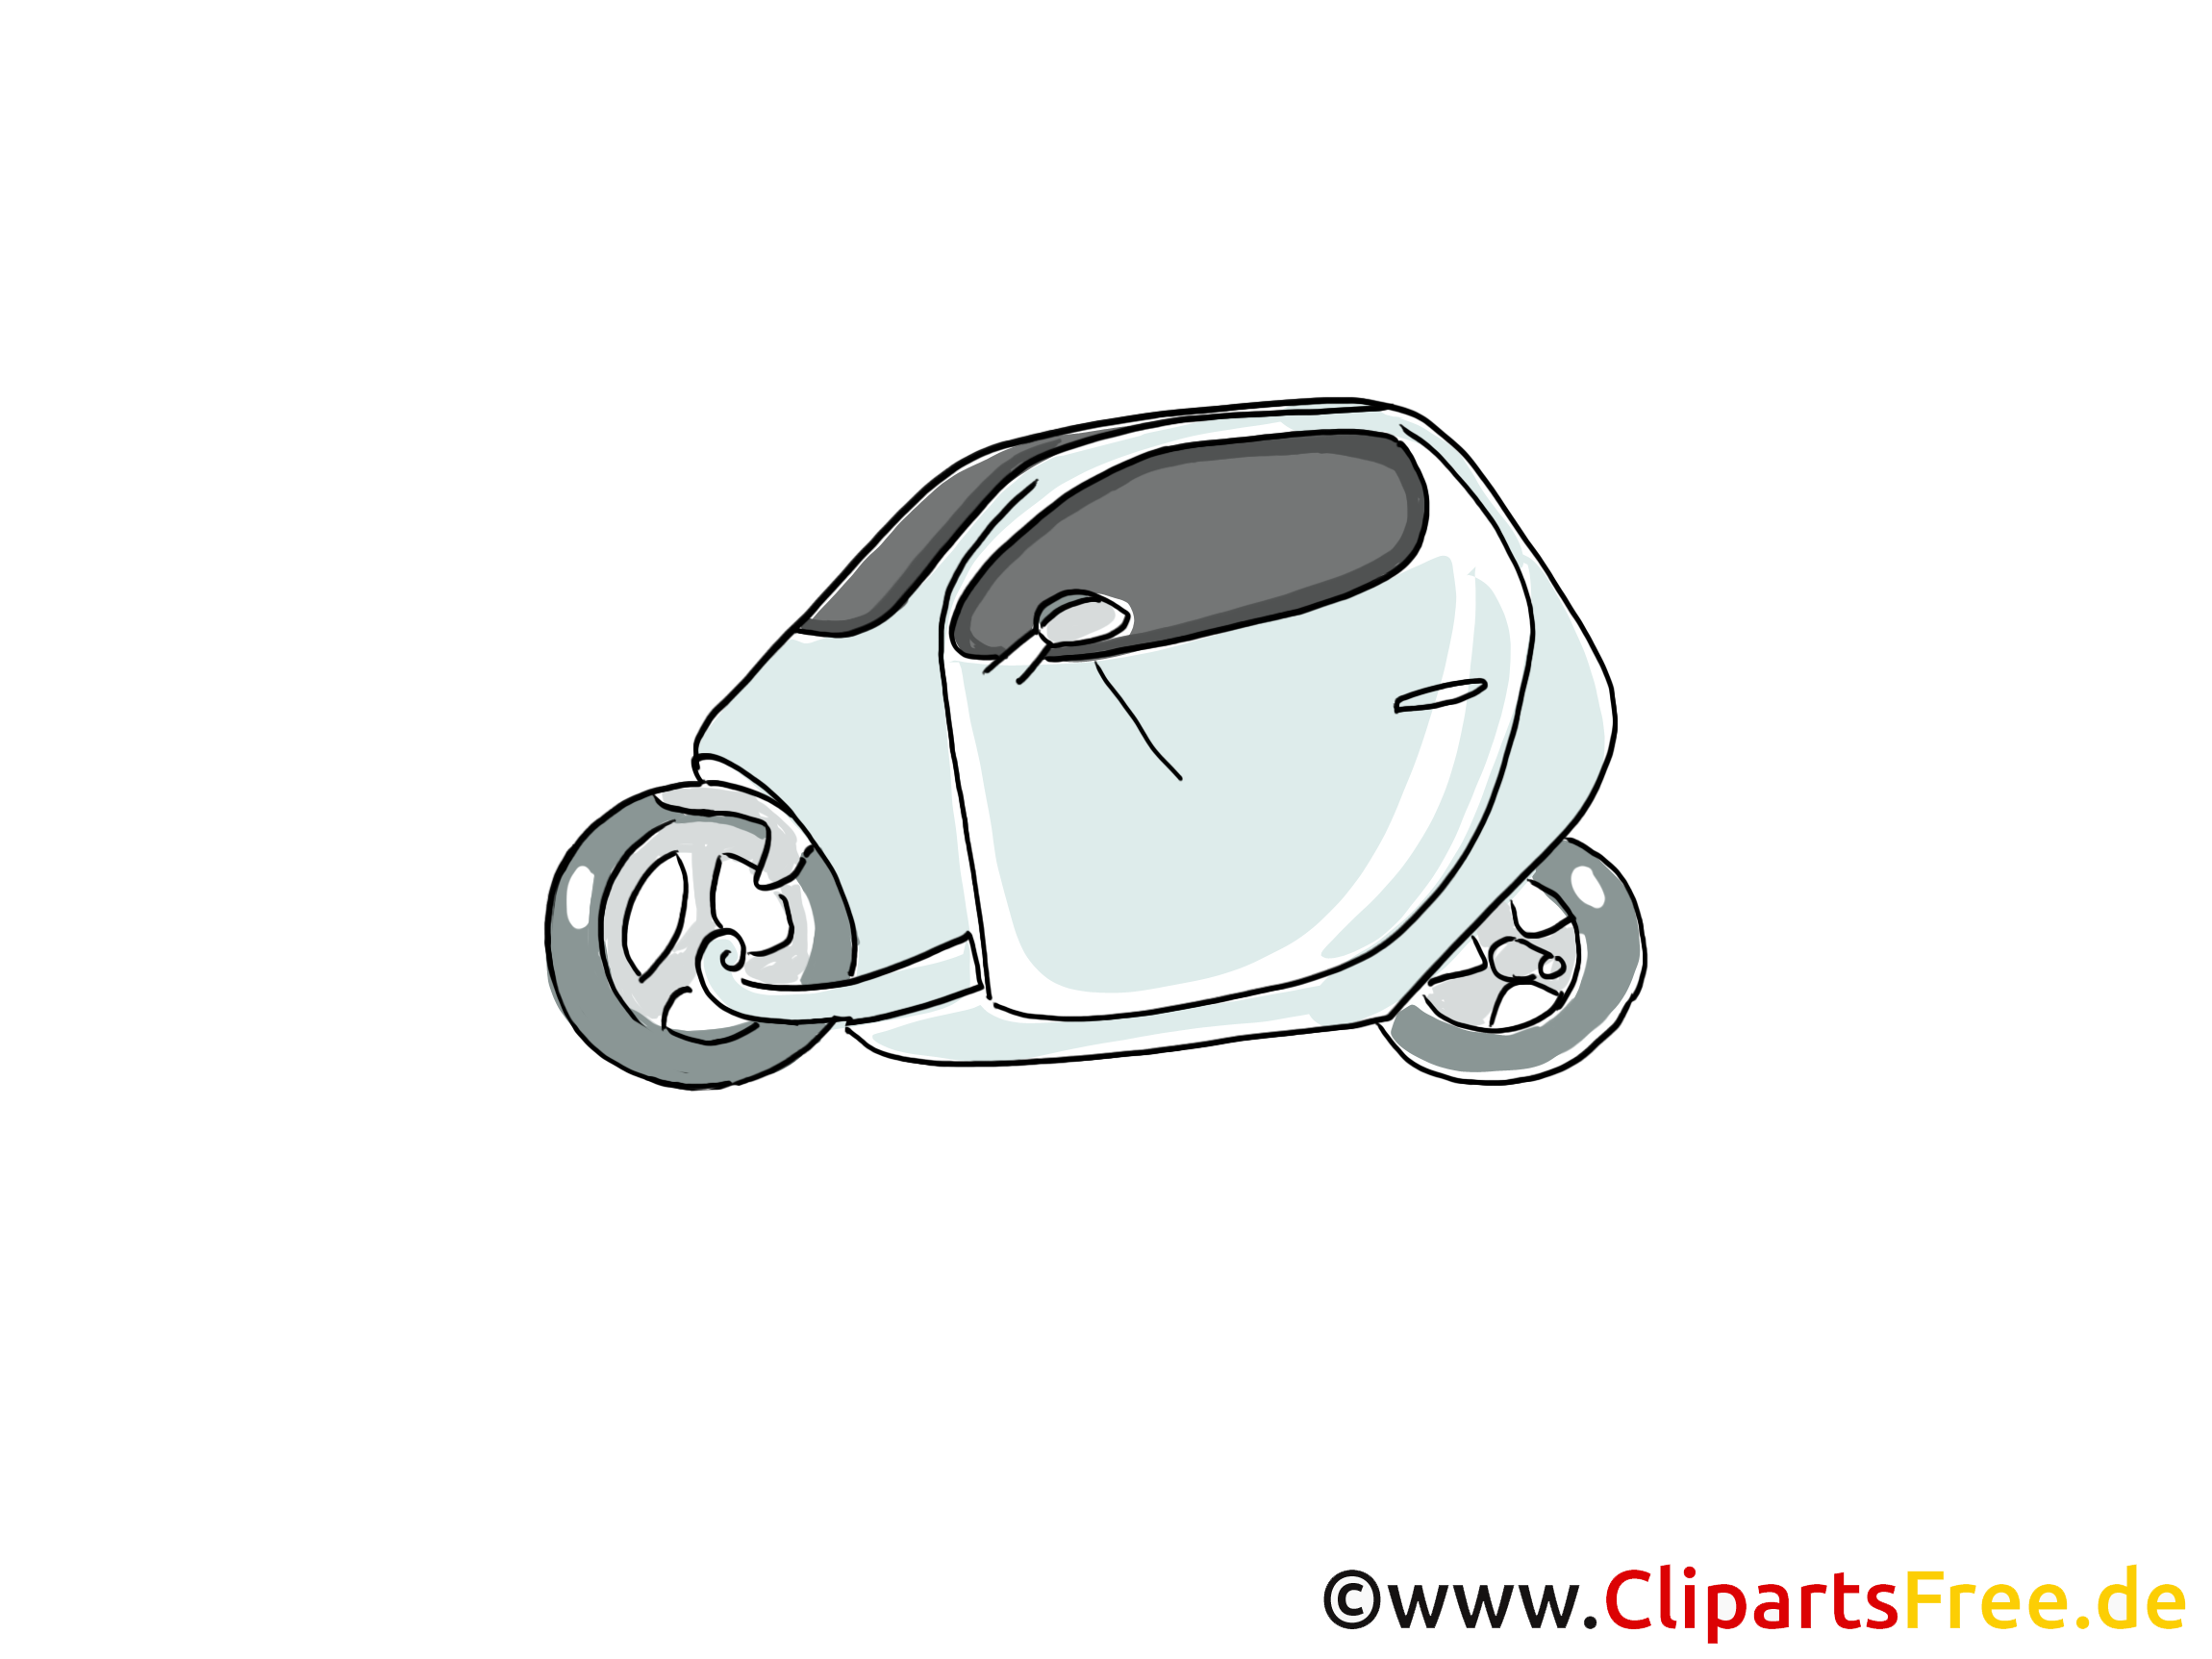 Petite voiture clip art image gratuite